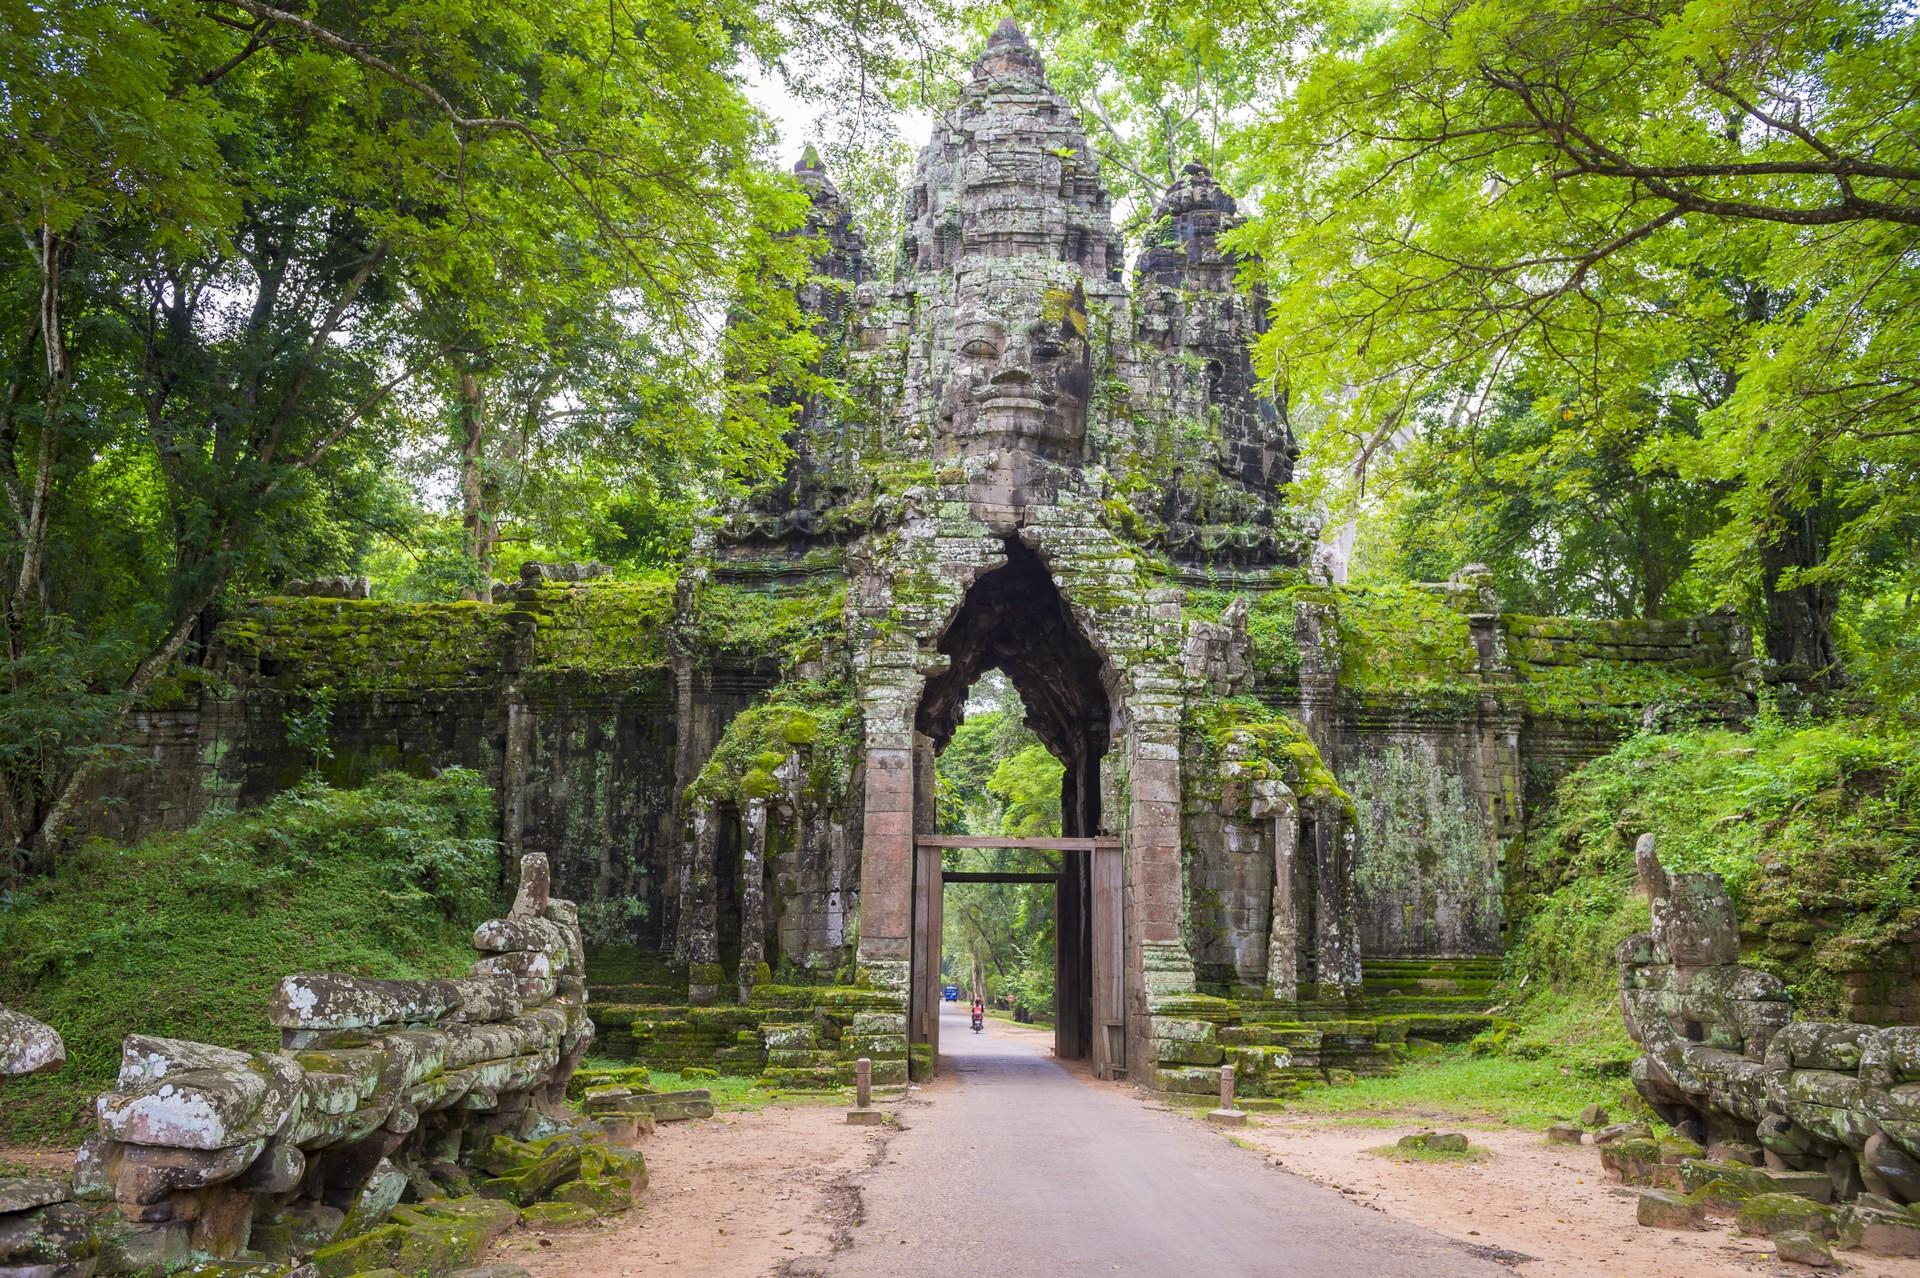 North Gate of Angkor Thom, Cambodia